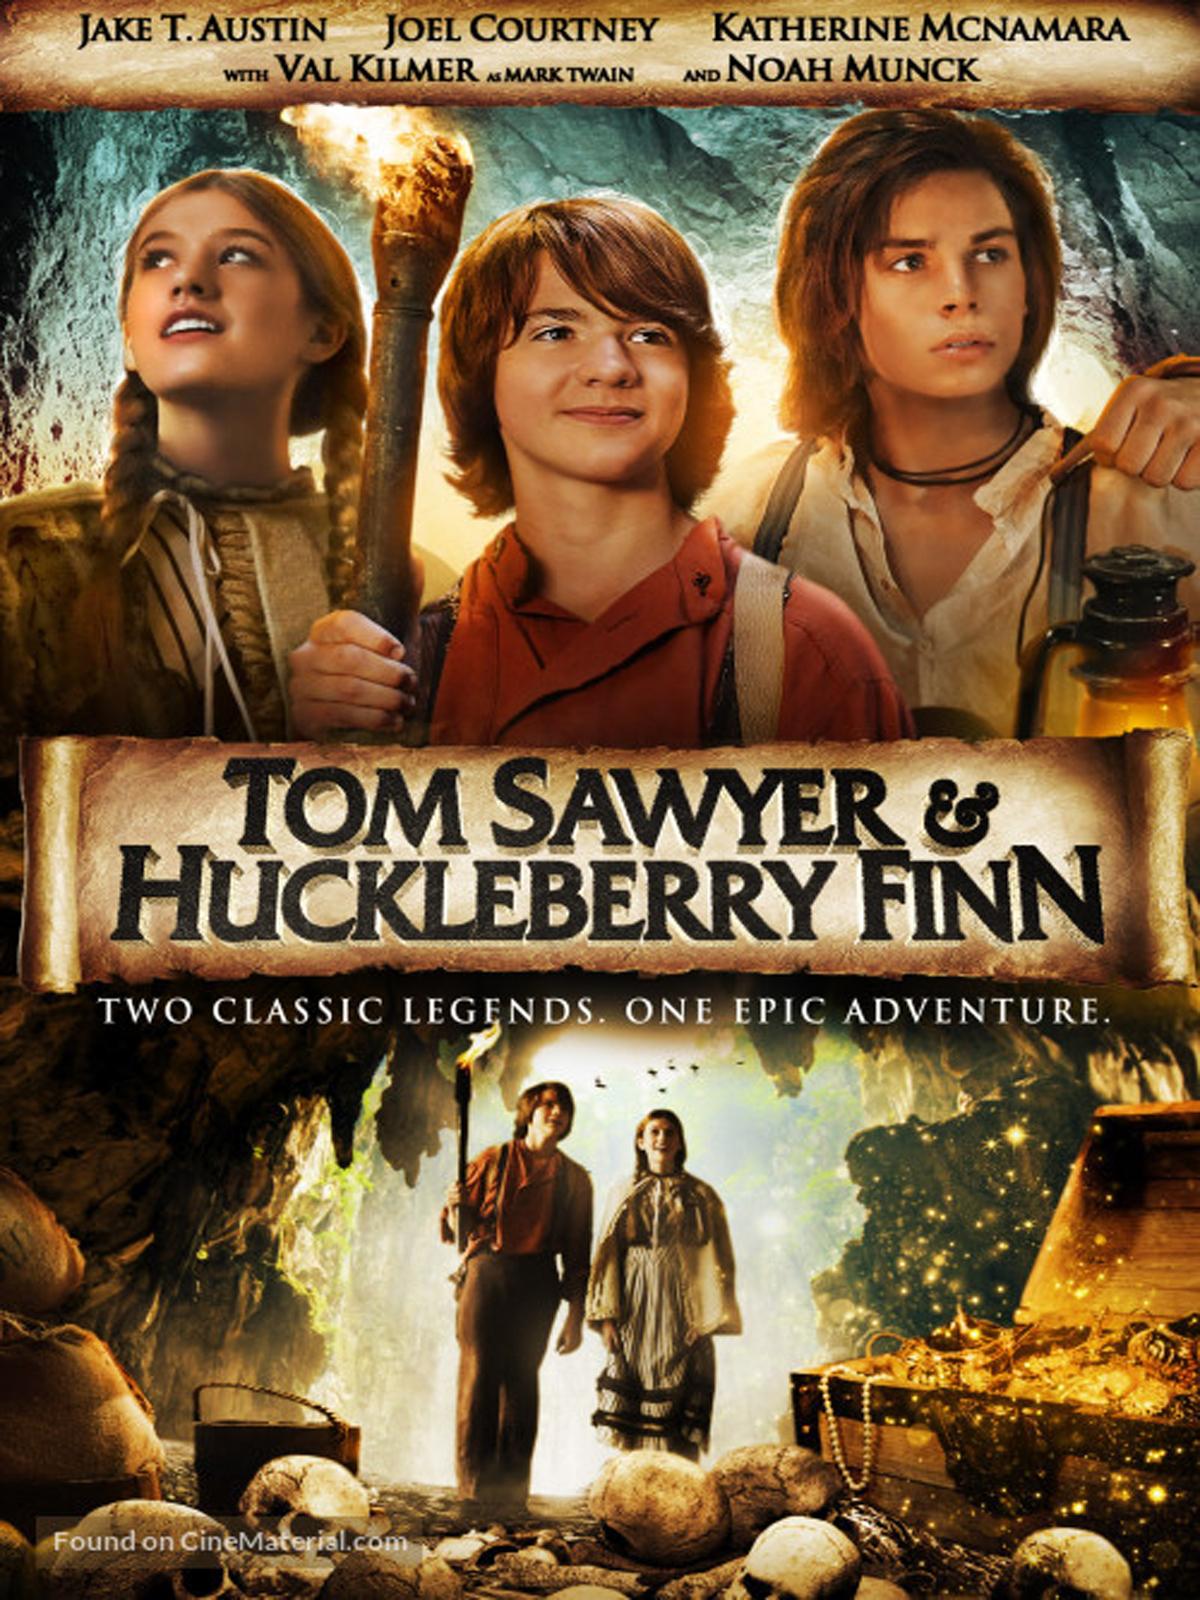 Katherine Mcnamara Tom Sawyer And Huckleberry Finn